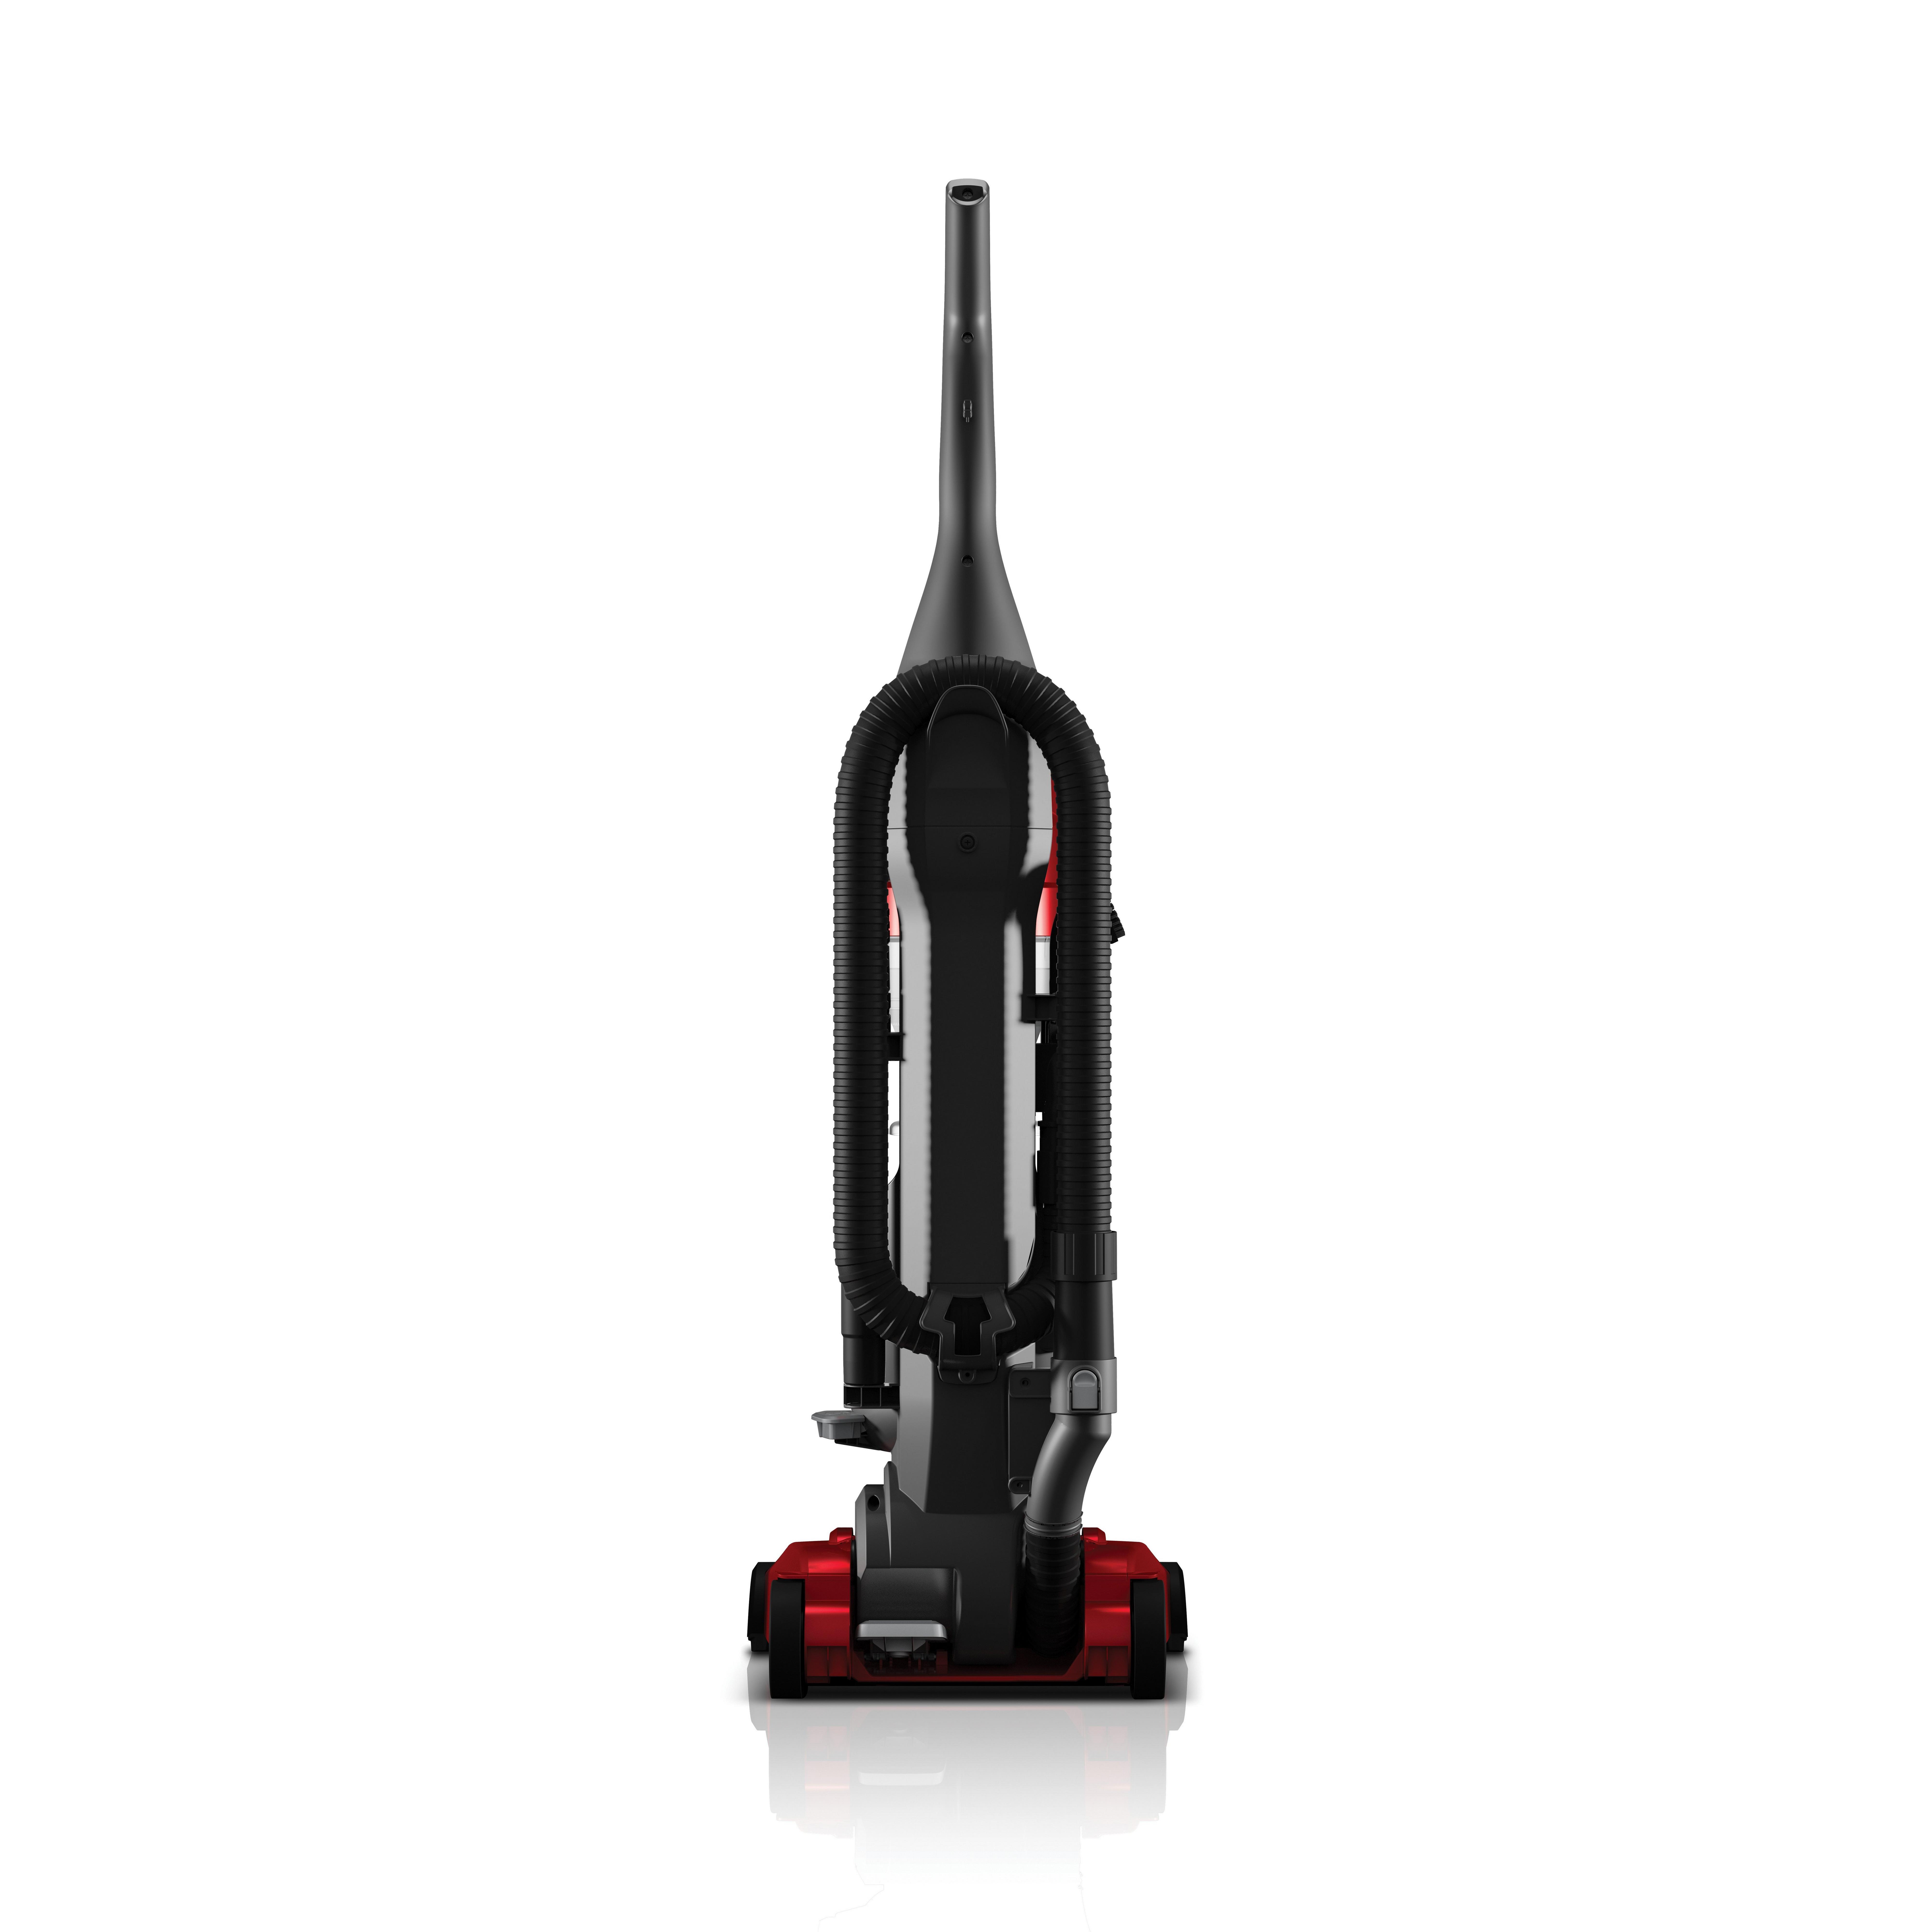 Hoover-Elite-Rewind-Upright-Vacuum-Cleaner-Damaged-Box-UH71012DM thumbnail 5